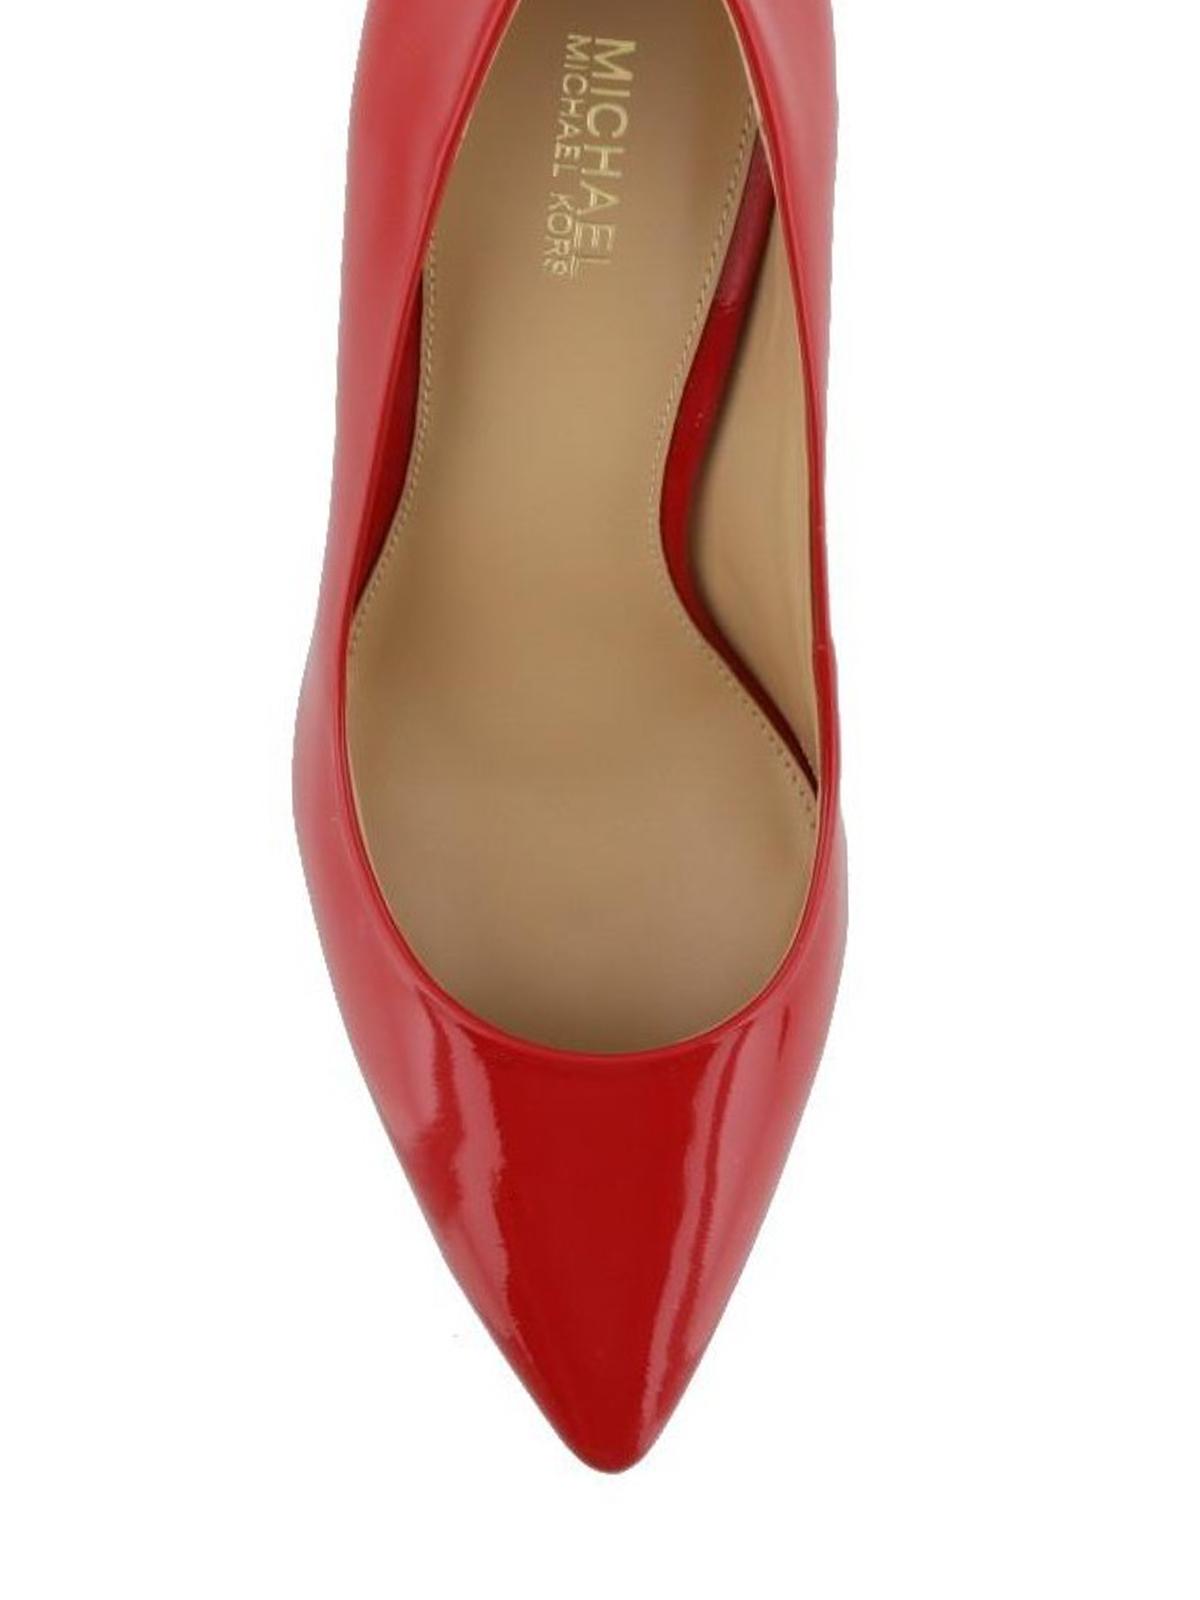 Michael Kors - Flex Mid-heel red patent